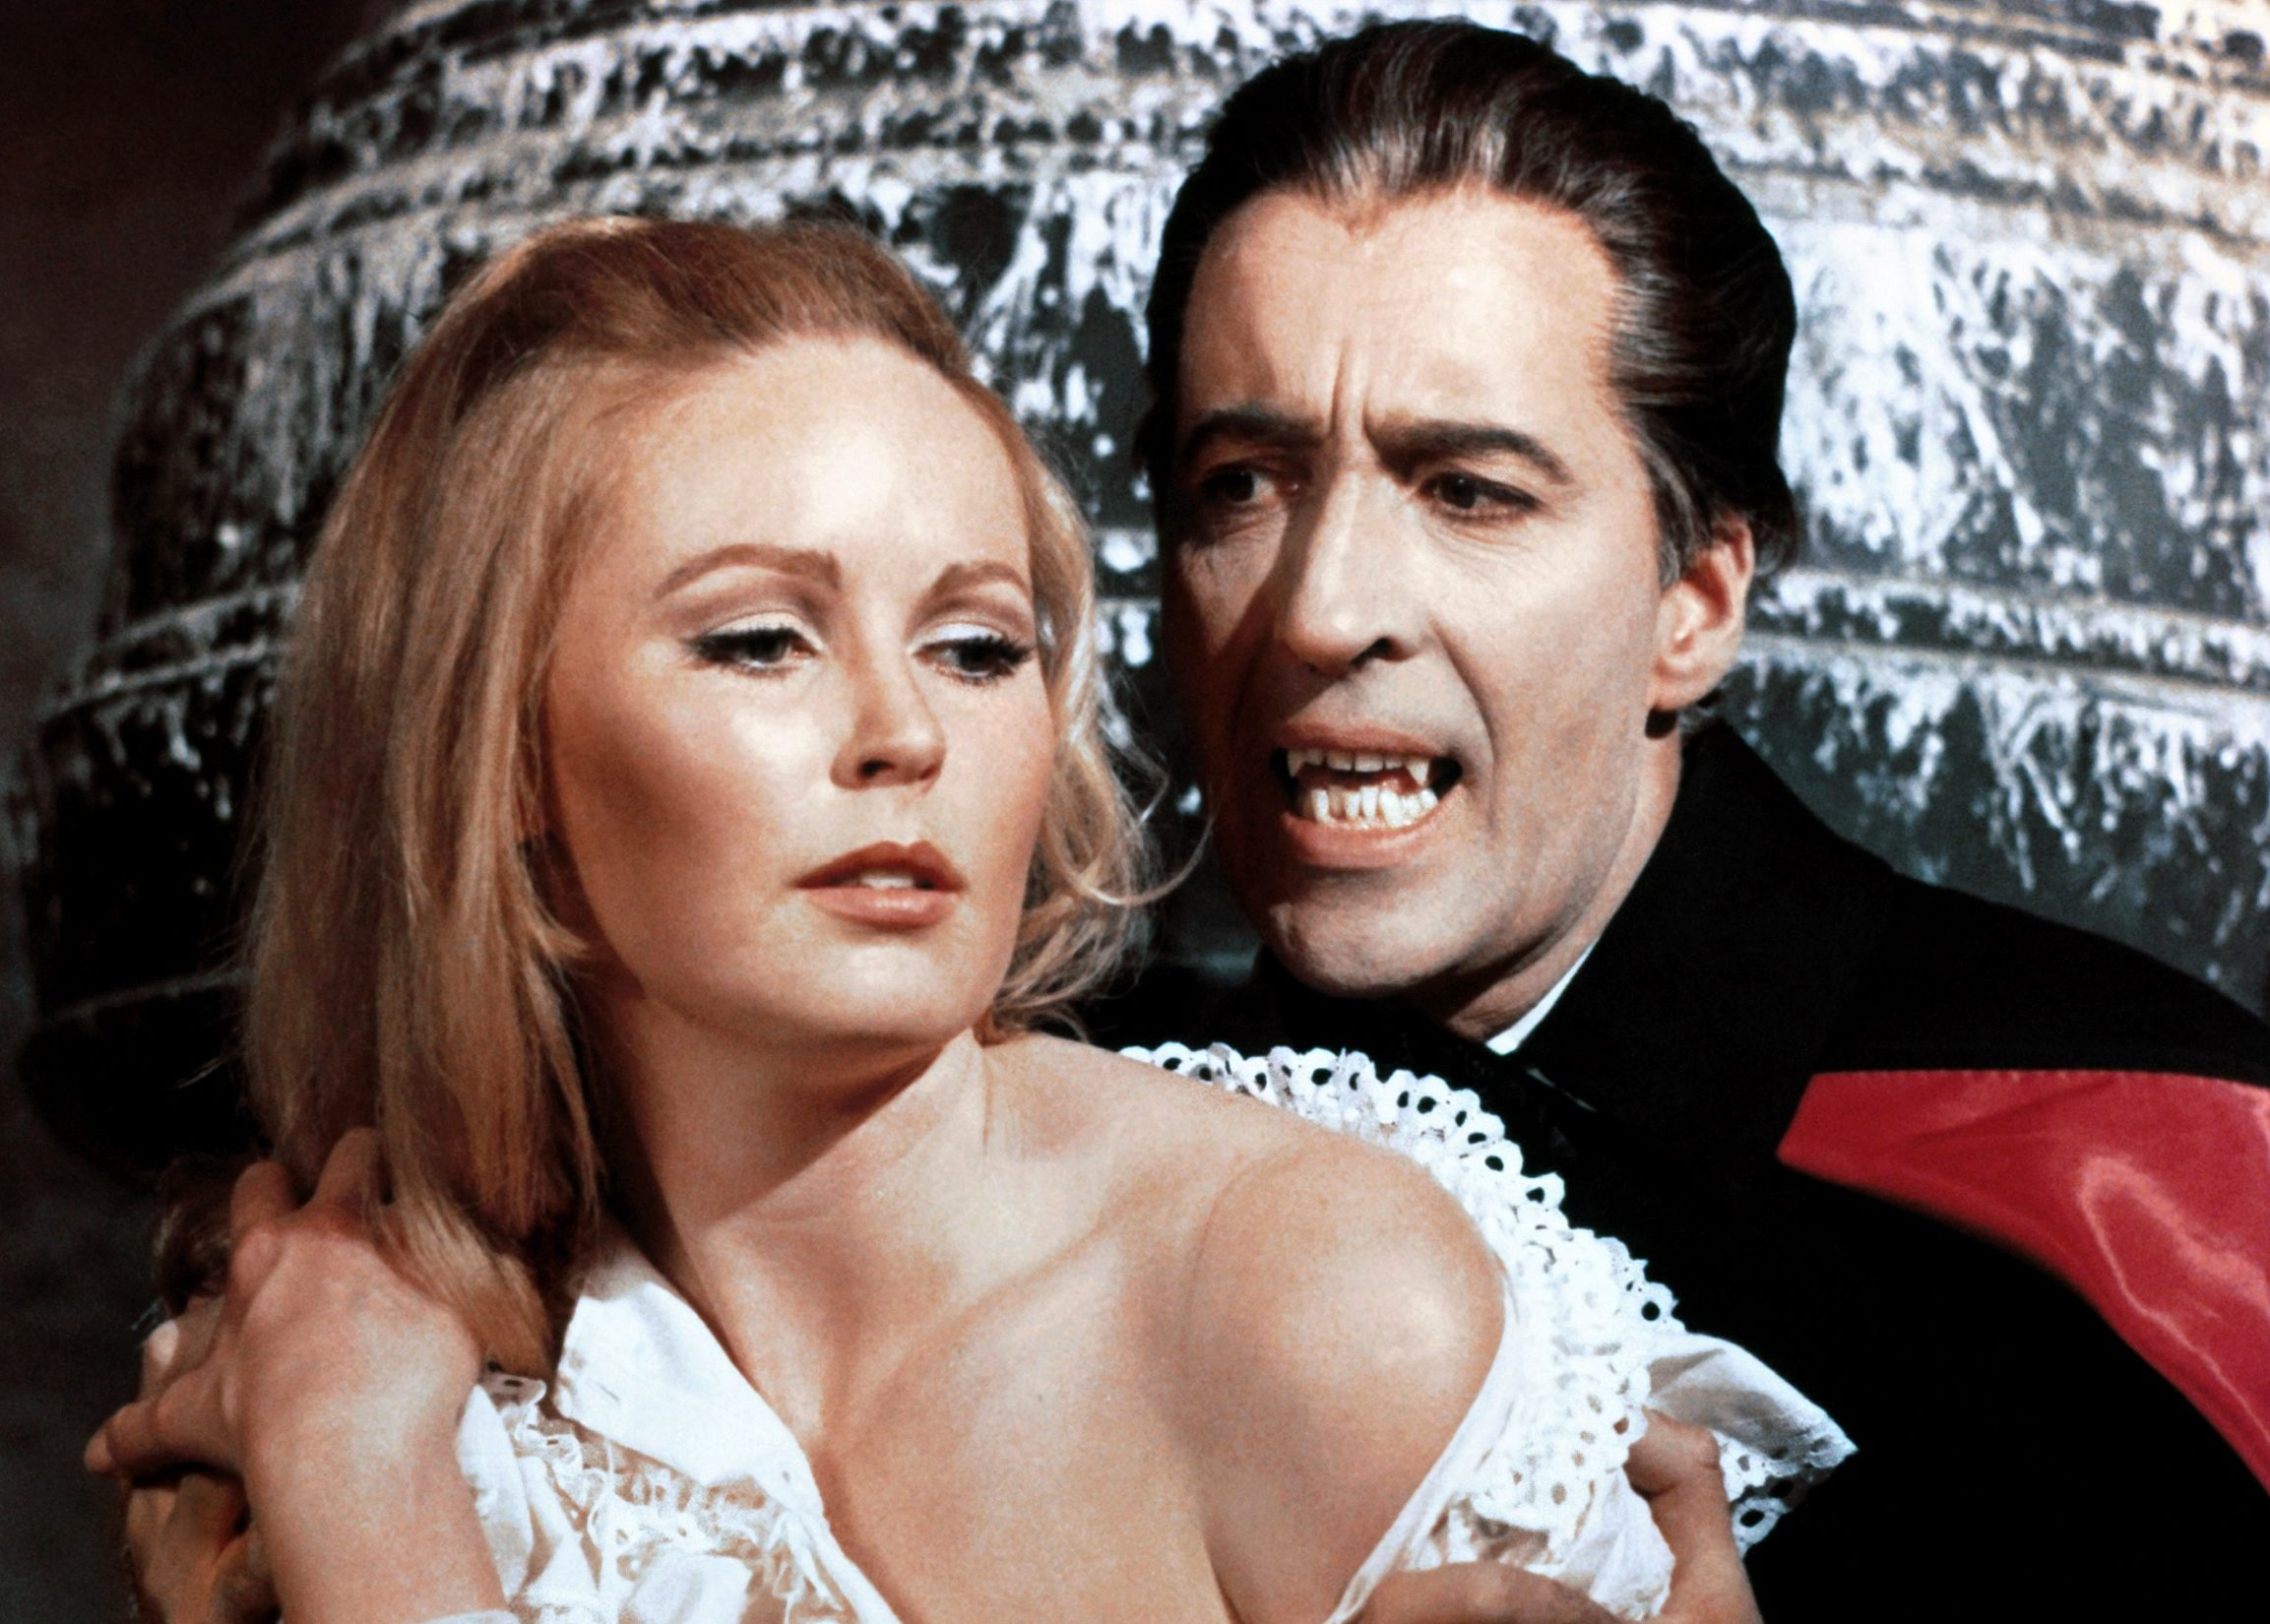 Christopher Lee stars as Count Dracula in the famous 1958 version of Bram Stoker's gothic horror novel.